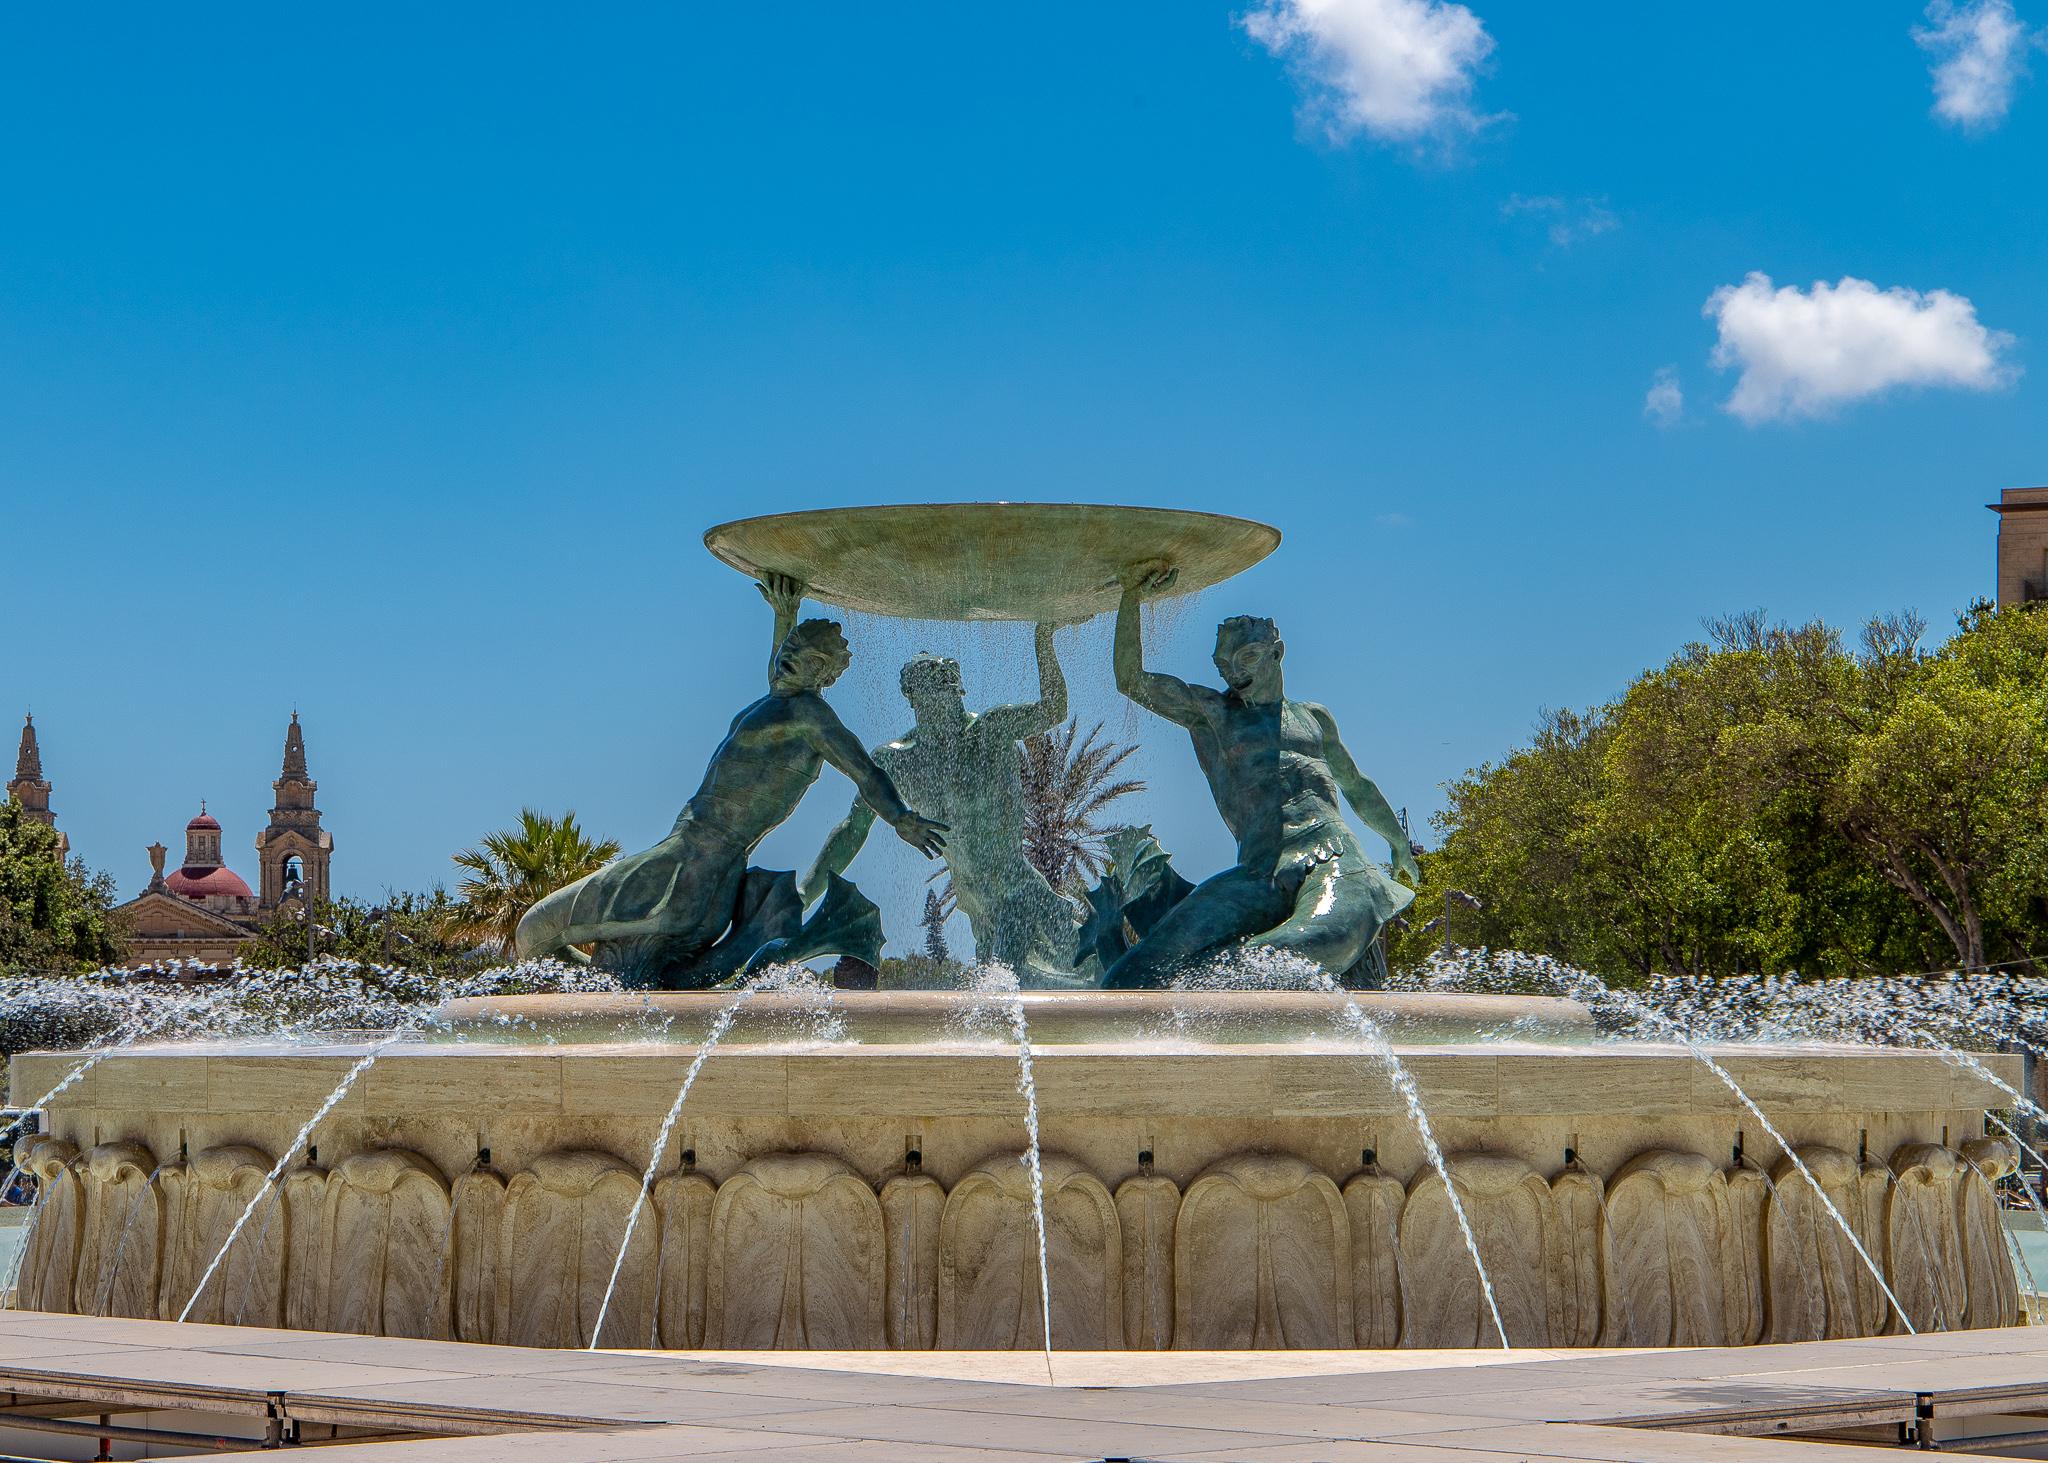 Sculpture depicting the Greek messenger god of the sea, Triton symbolising Malta's link to the sea